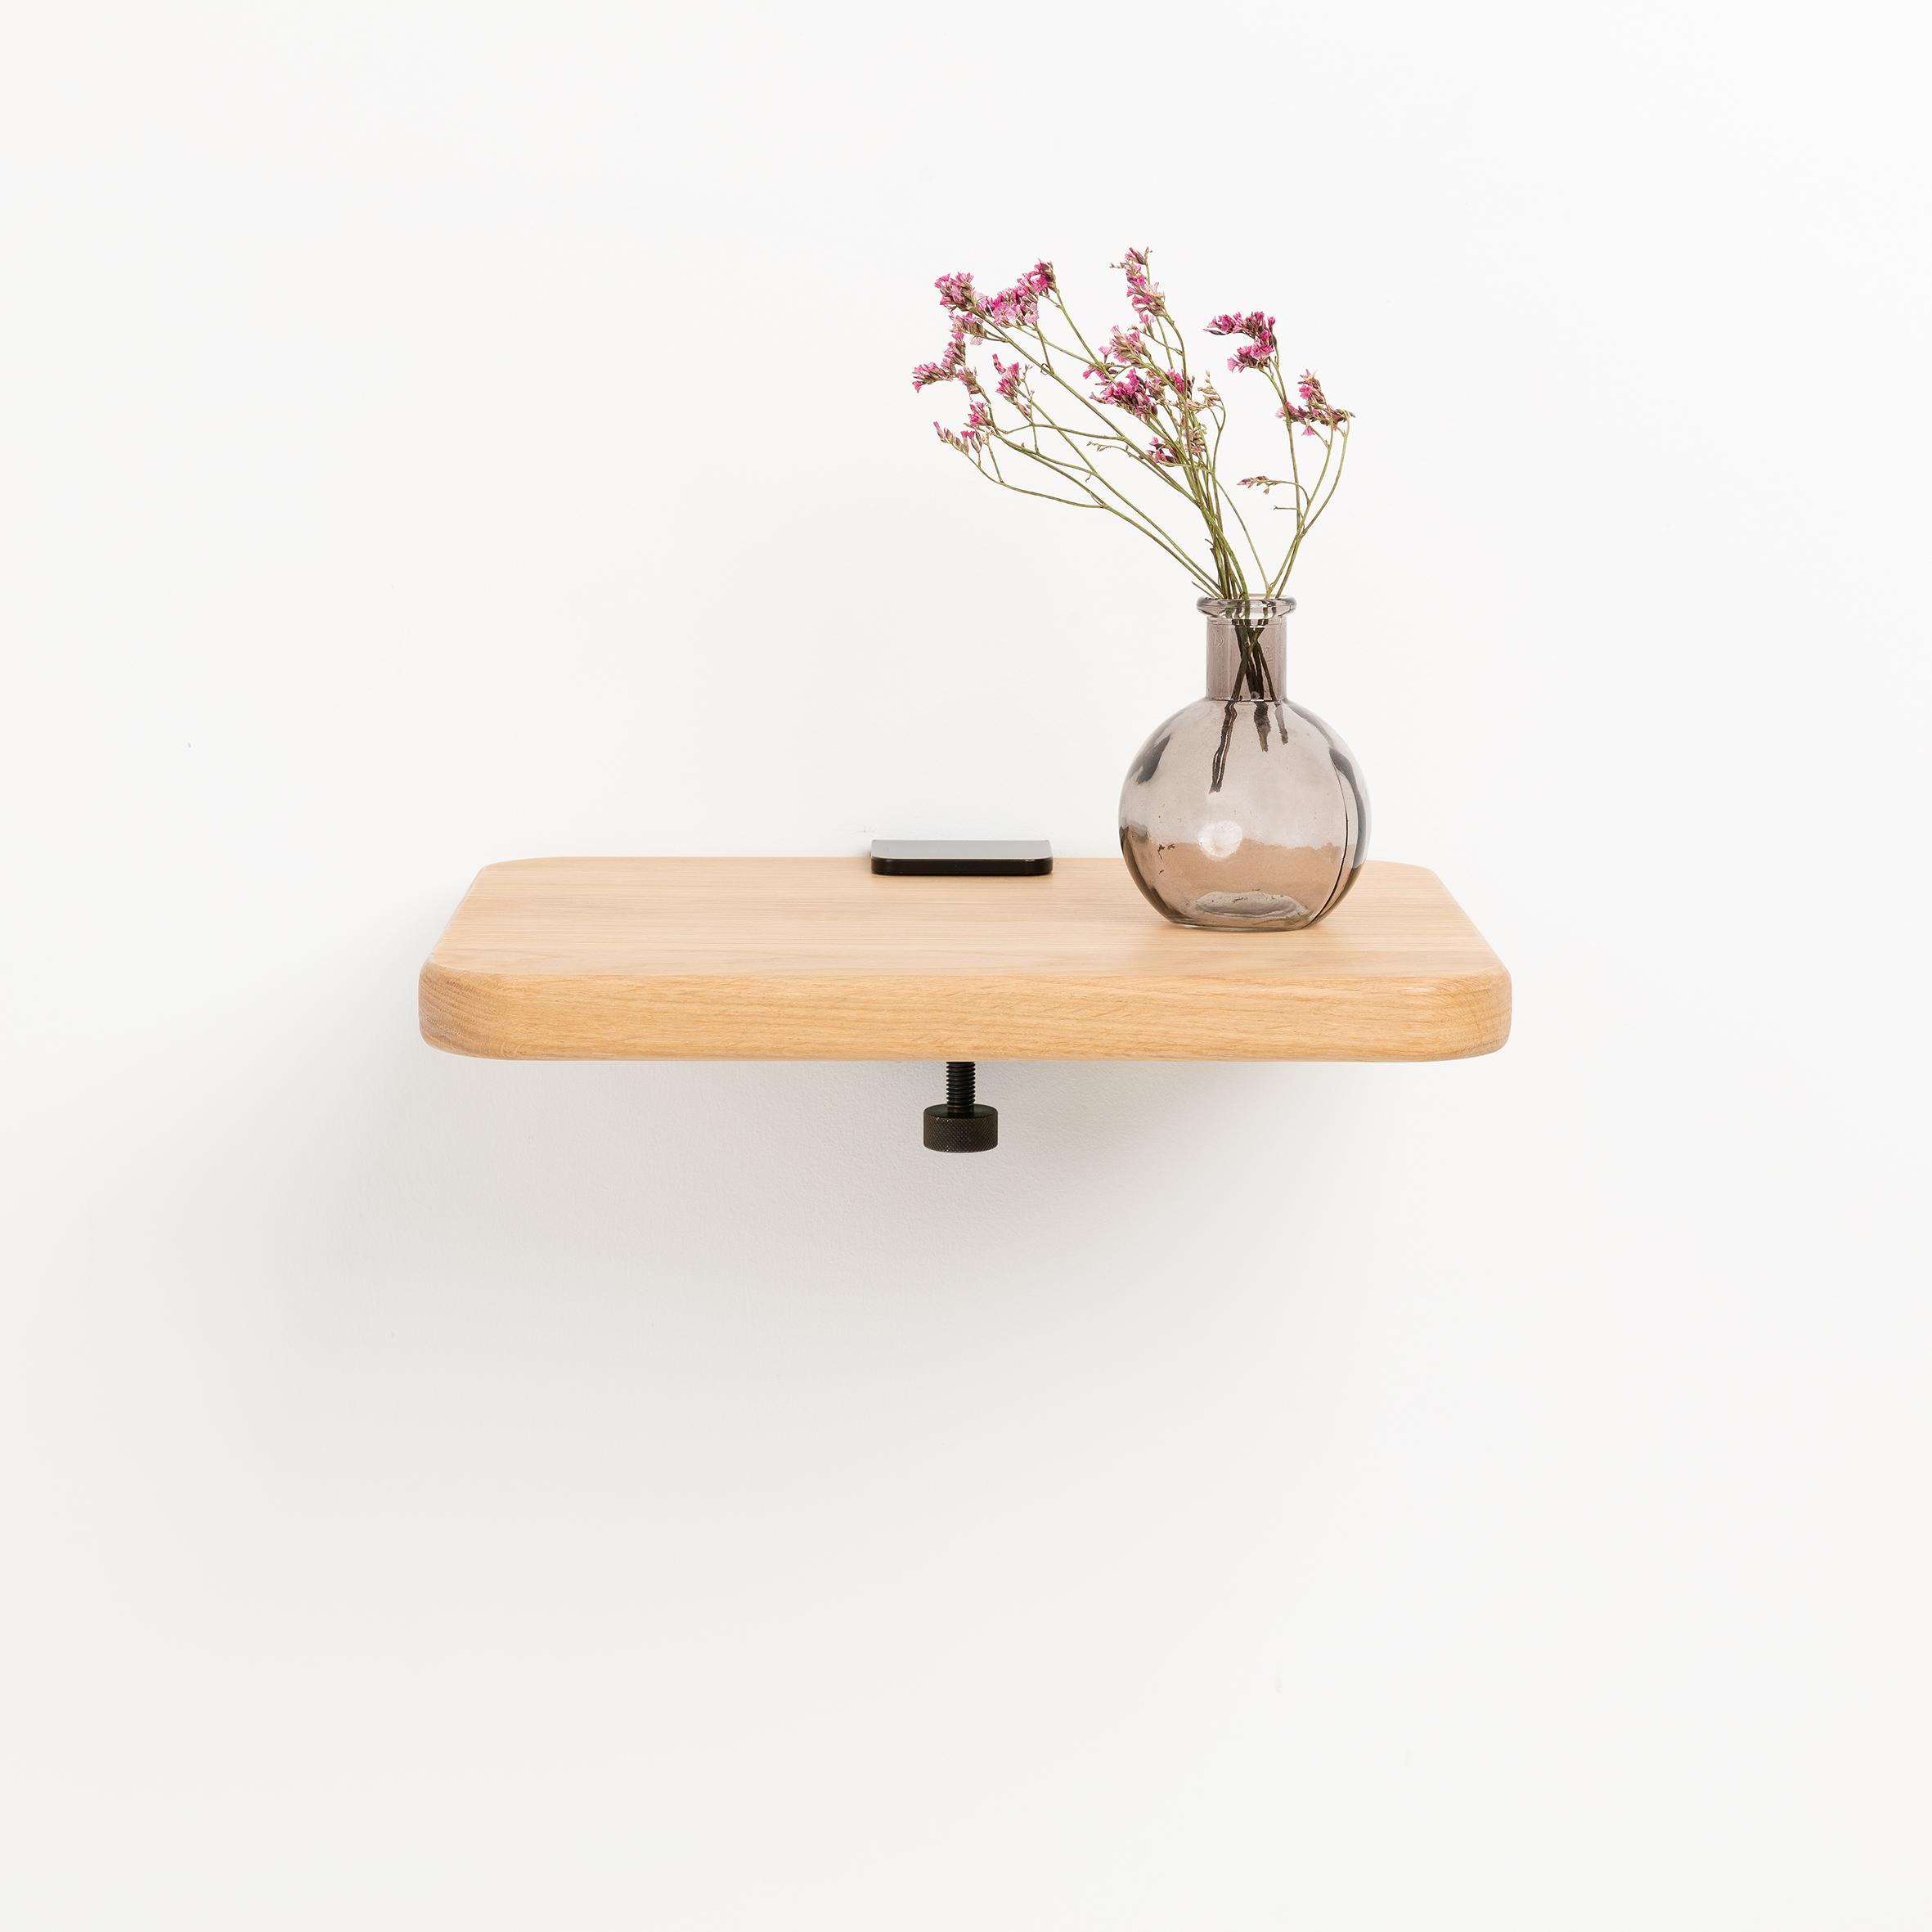 Table De Chevet Tiptoe Accroche Murale Et Chene Massif 32x27cm